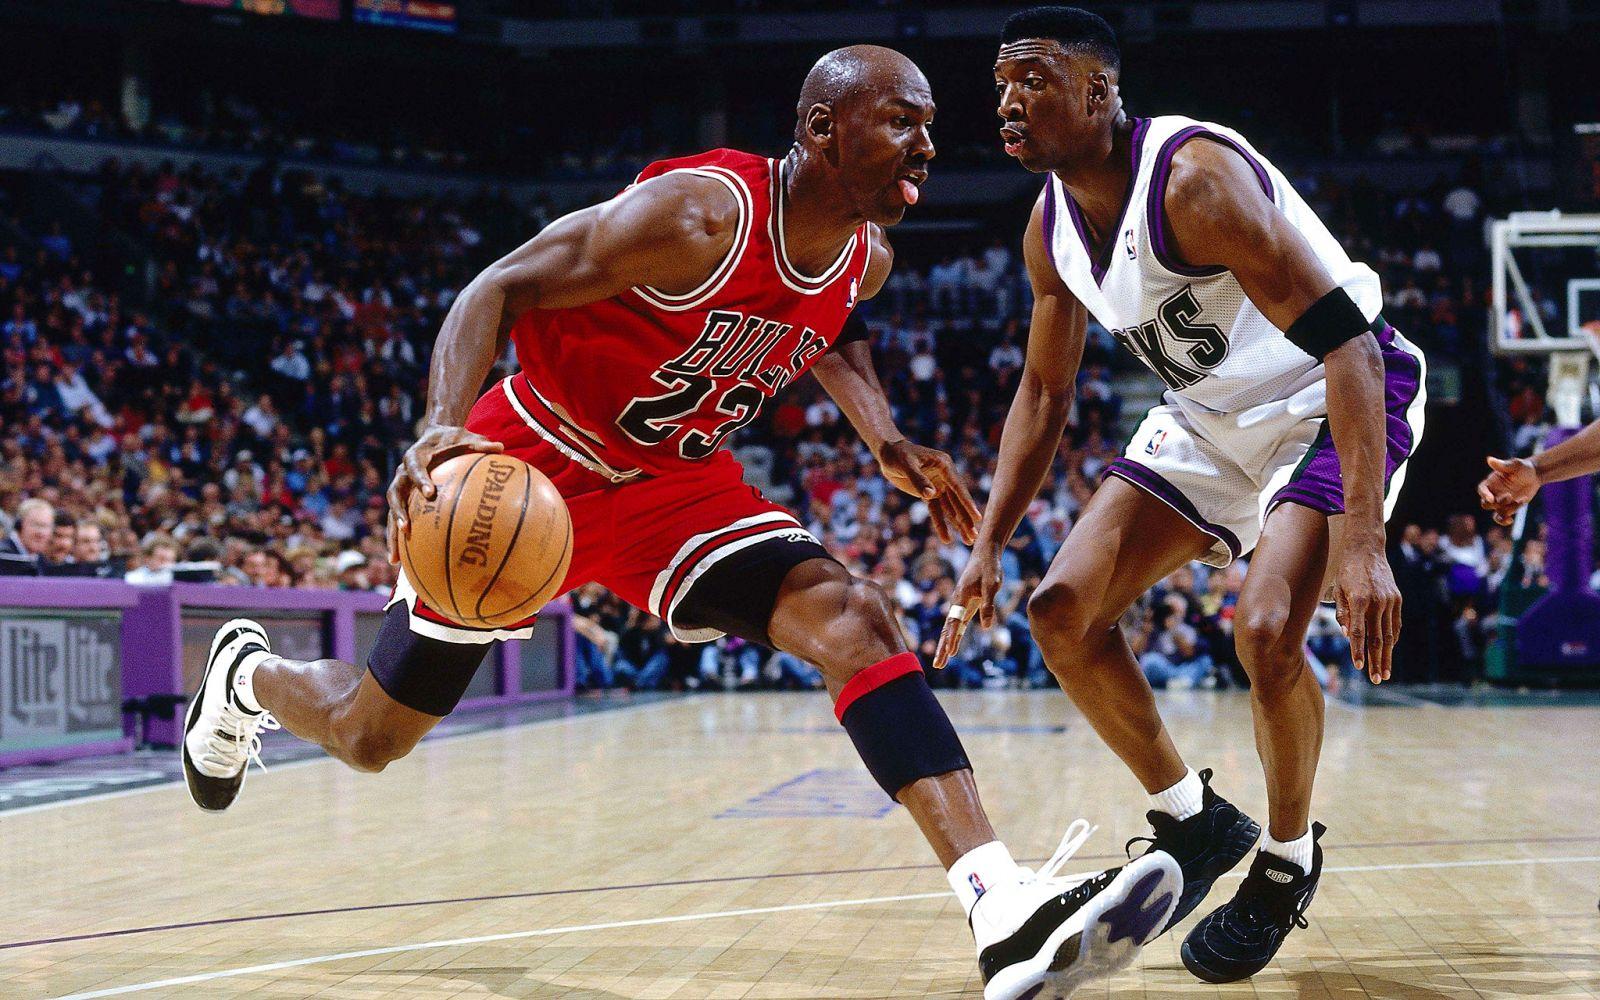 Nike Nba Shoes Jordan